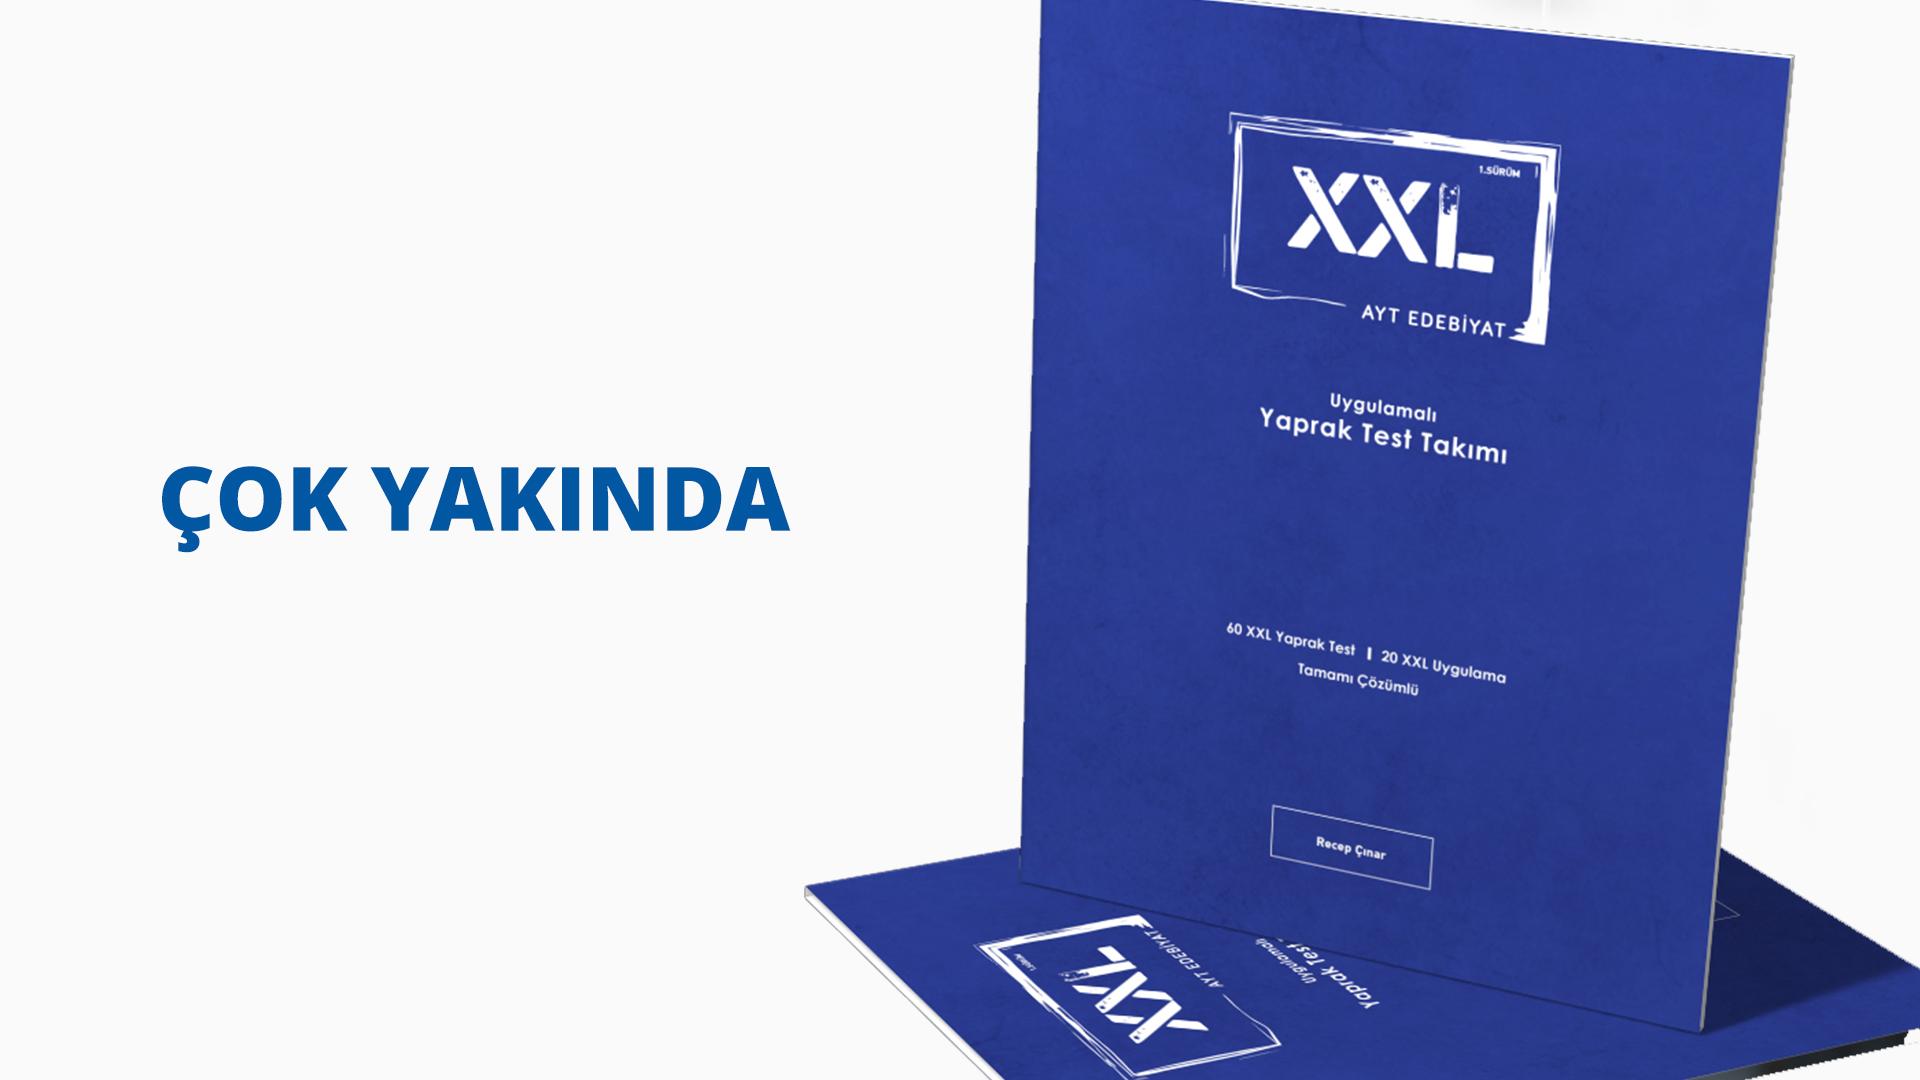 xxl-edebiyat-yaprak-test-takimi